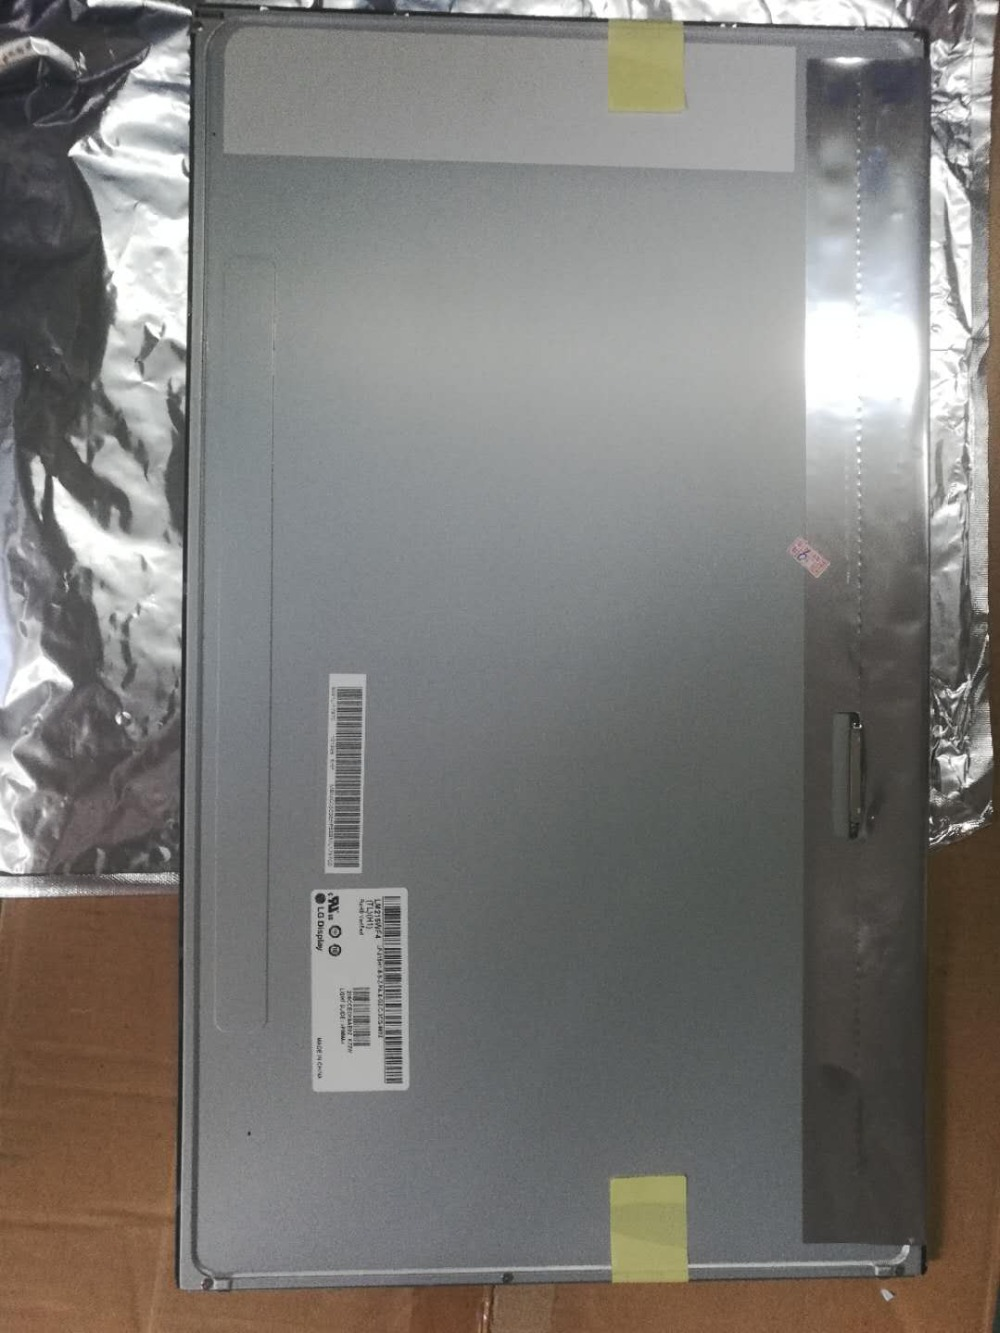 New original LM215WF4 TLGH1 TLH1 LM215WF4 TL H1 21 5 inch display Screen Modules glossy